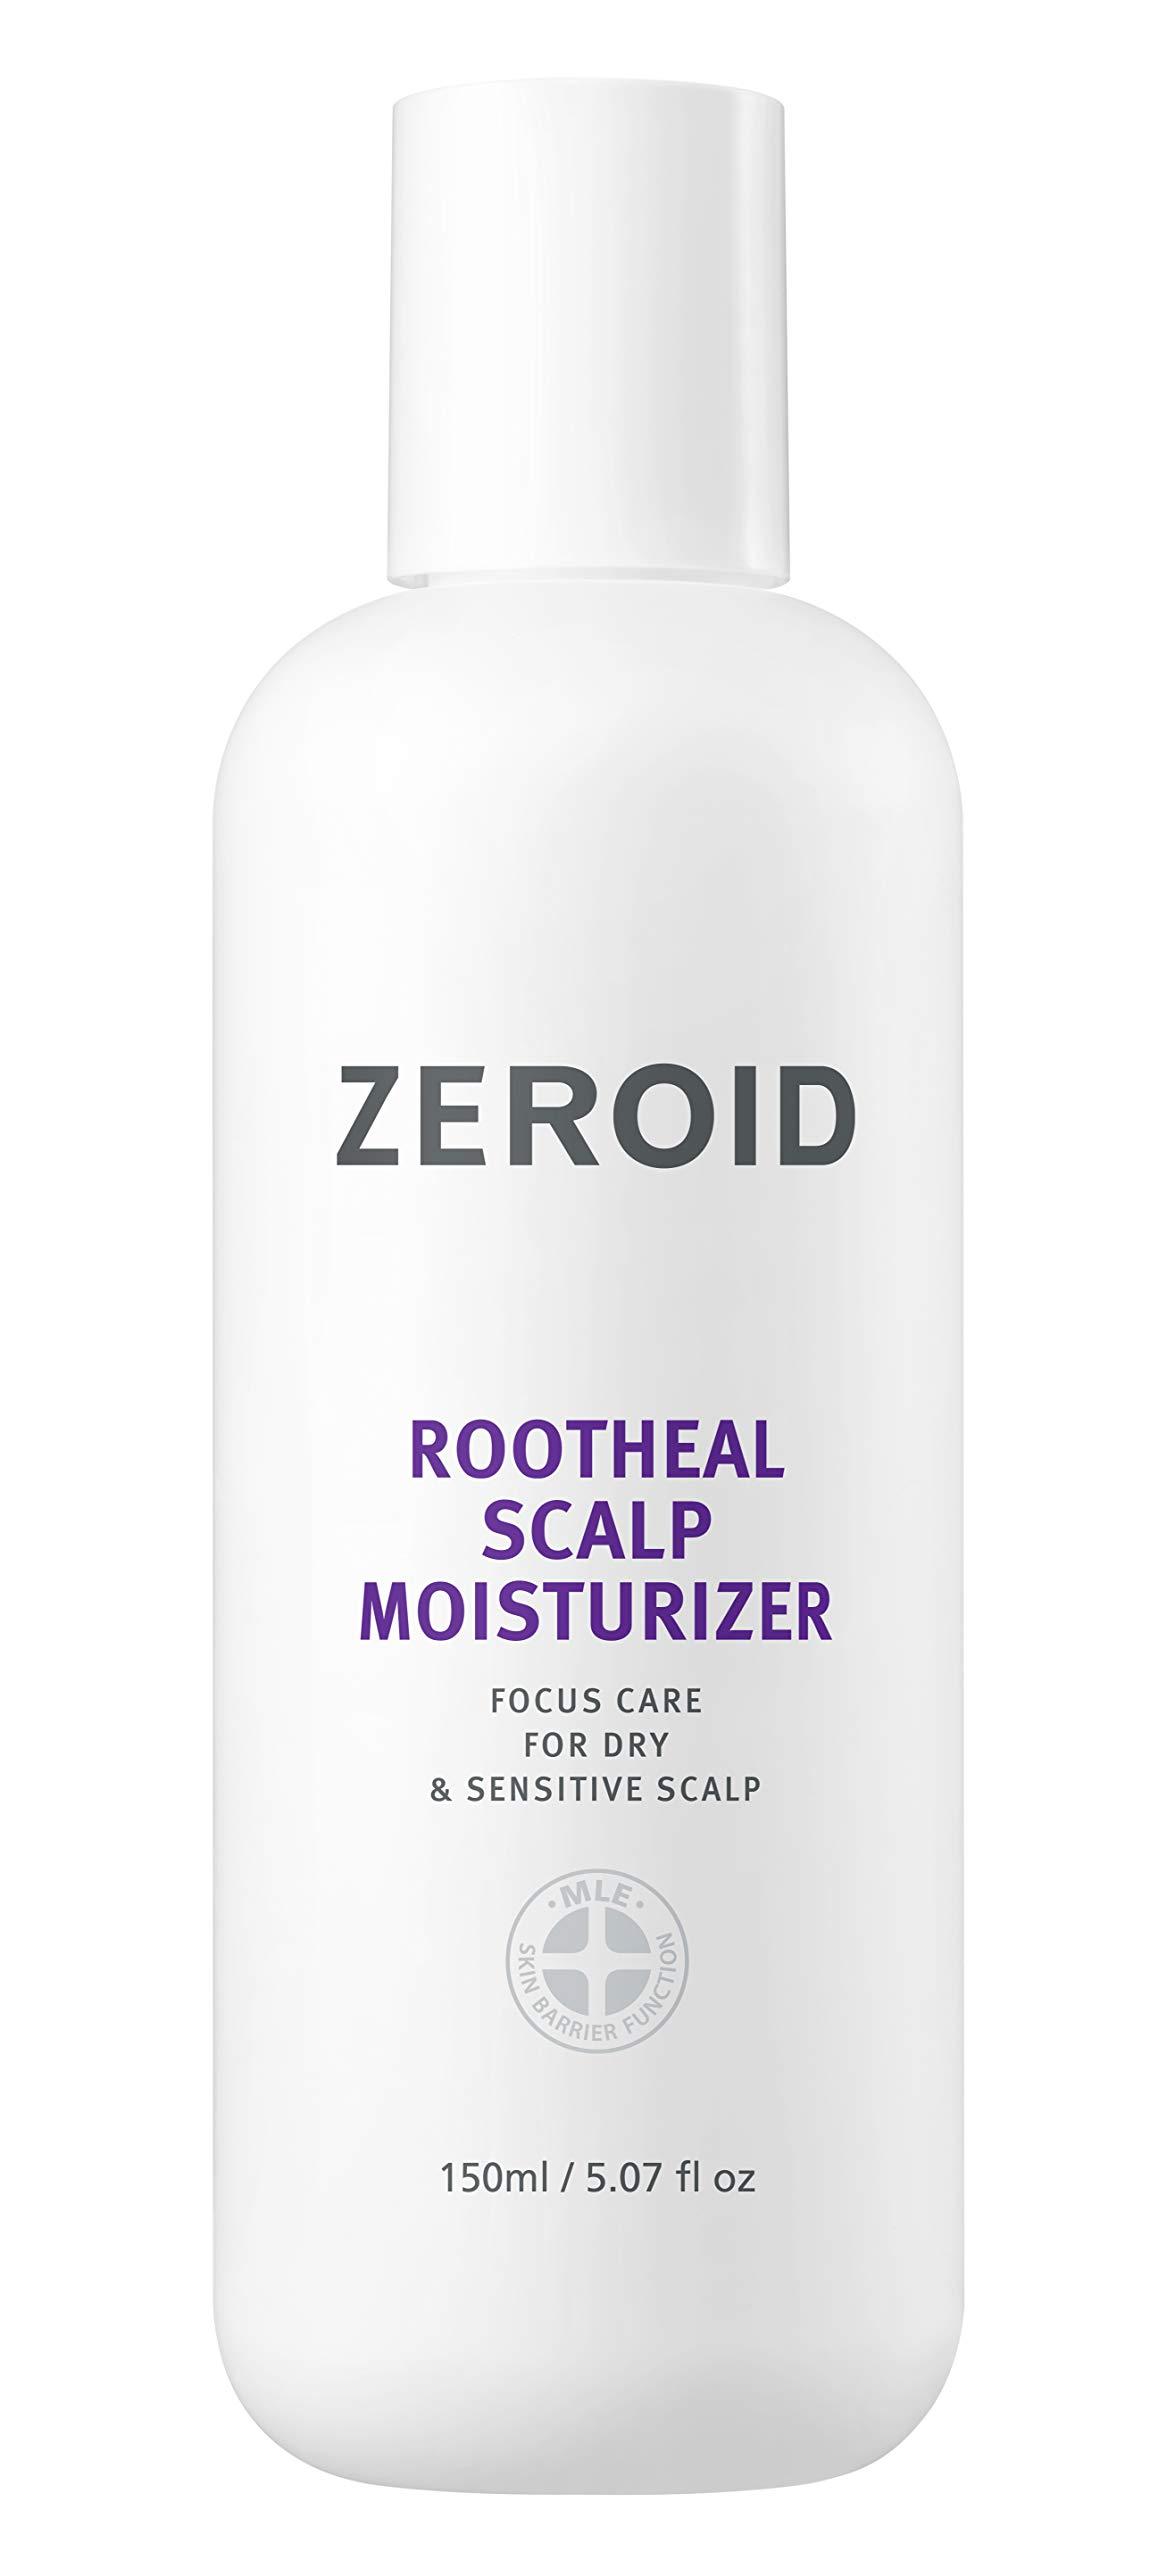 ZEROID Rootheal Scalp Moisturizer Focus Care for Dry Sensitive Scalp (150 mL)